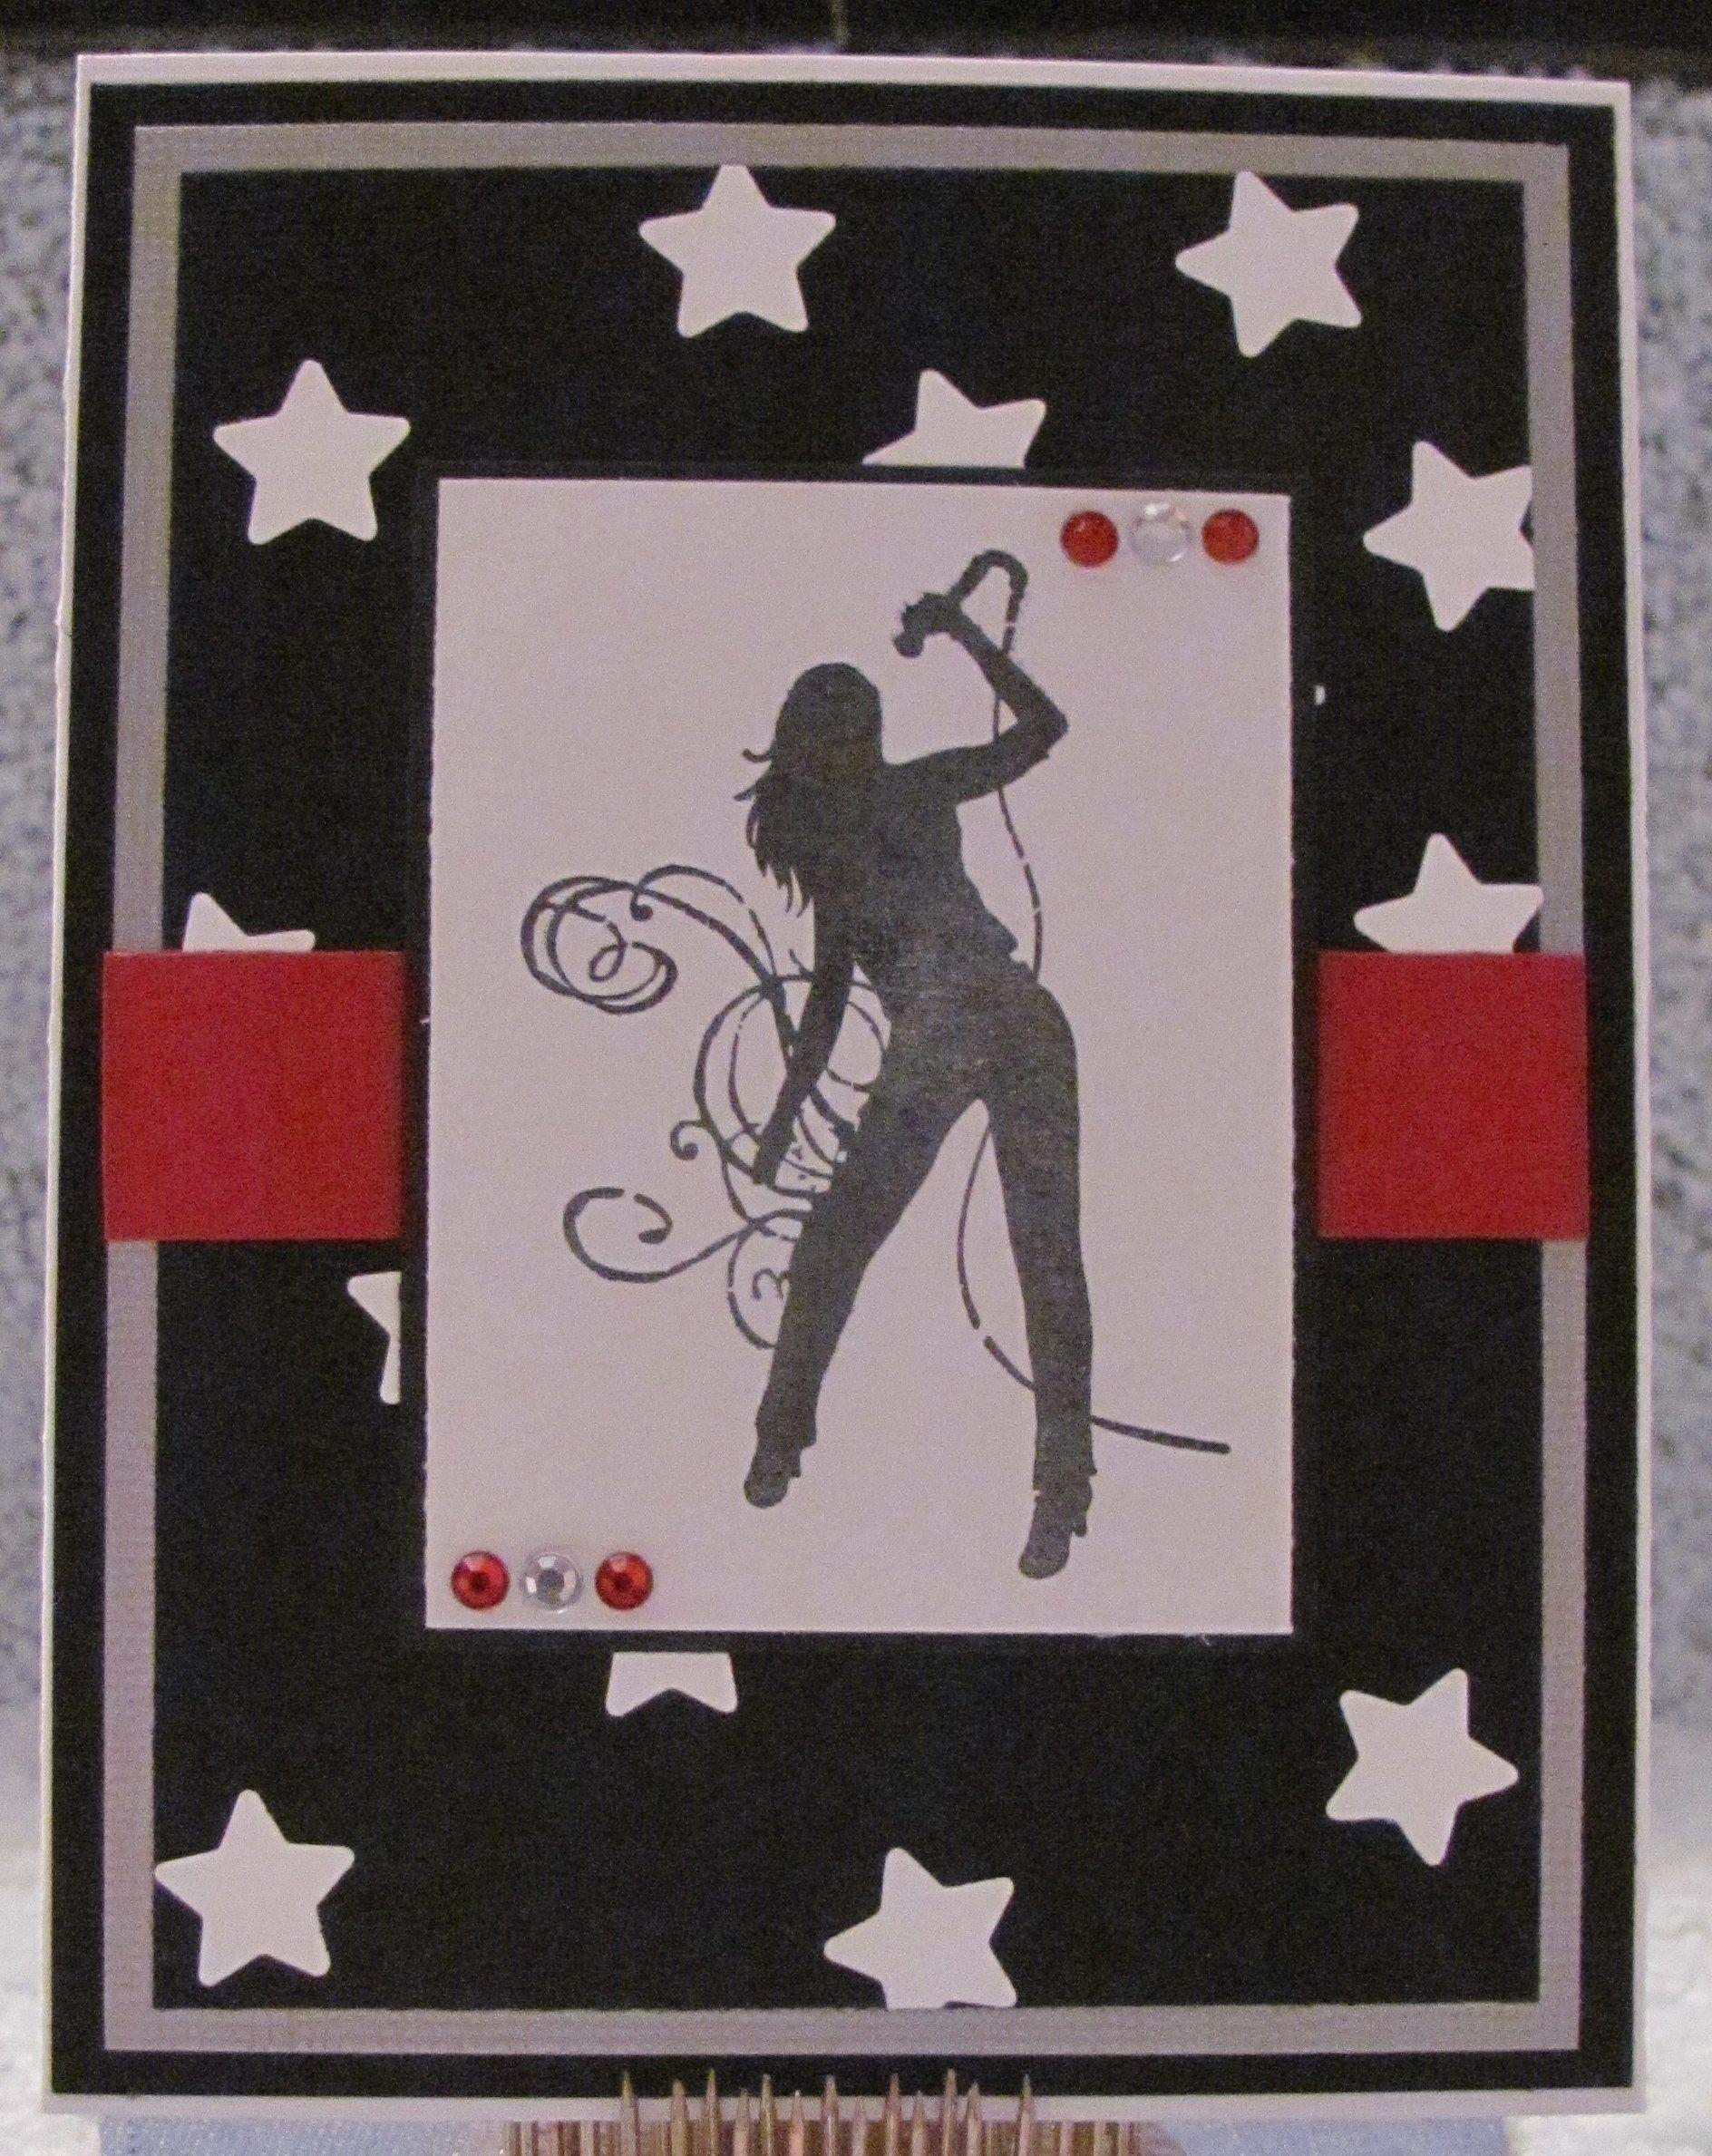 Rockstar Wannabe A2 Blank Handmade Fun Music Greeting Card By The